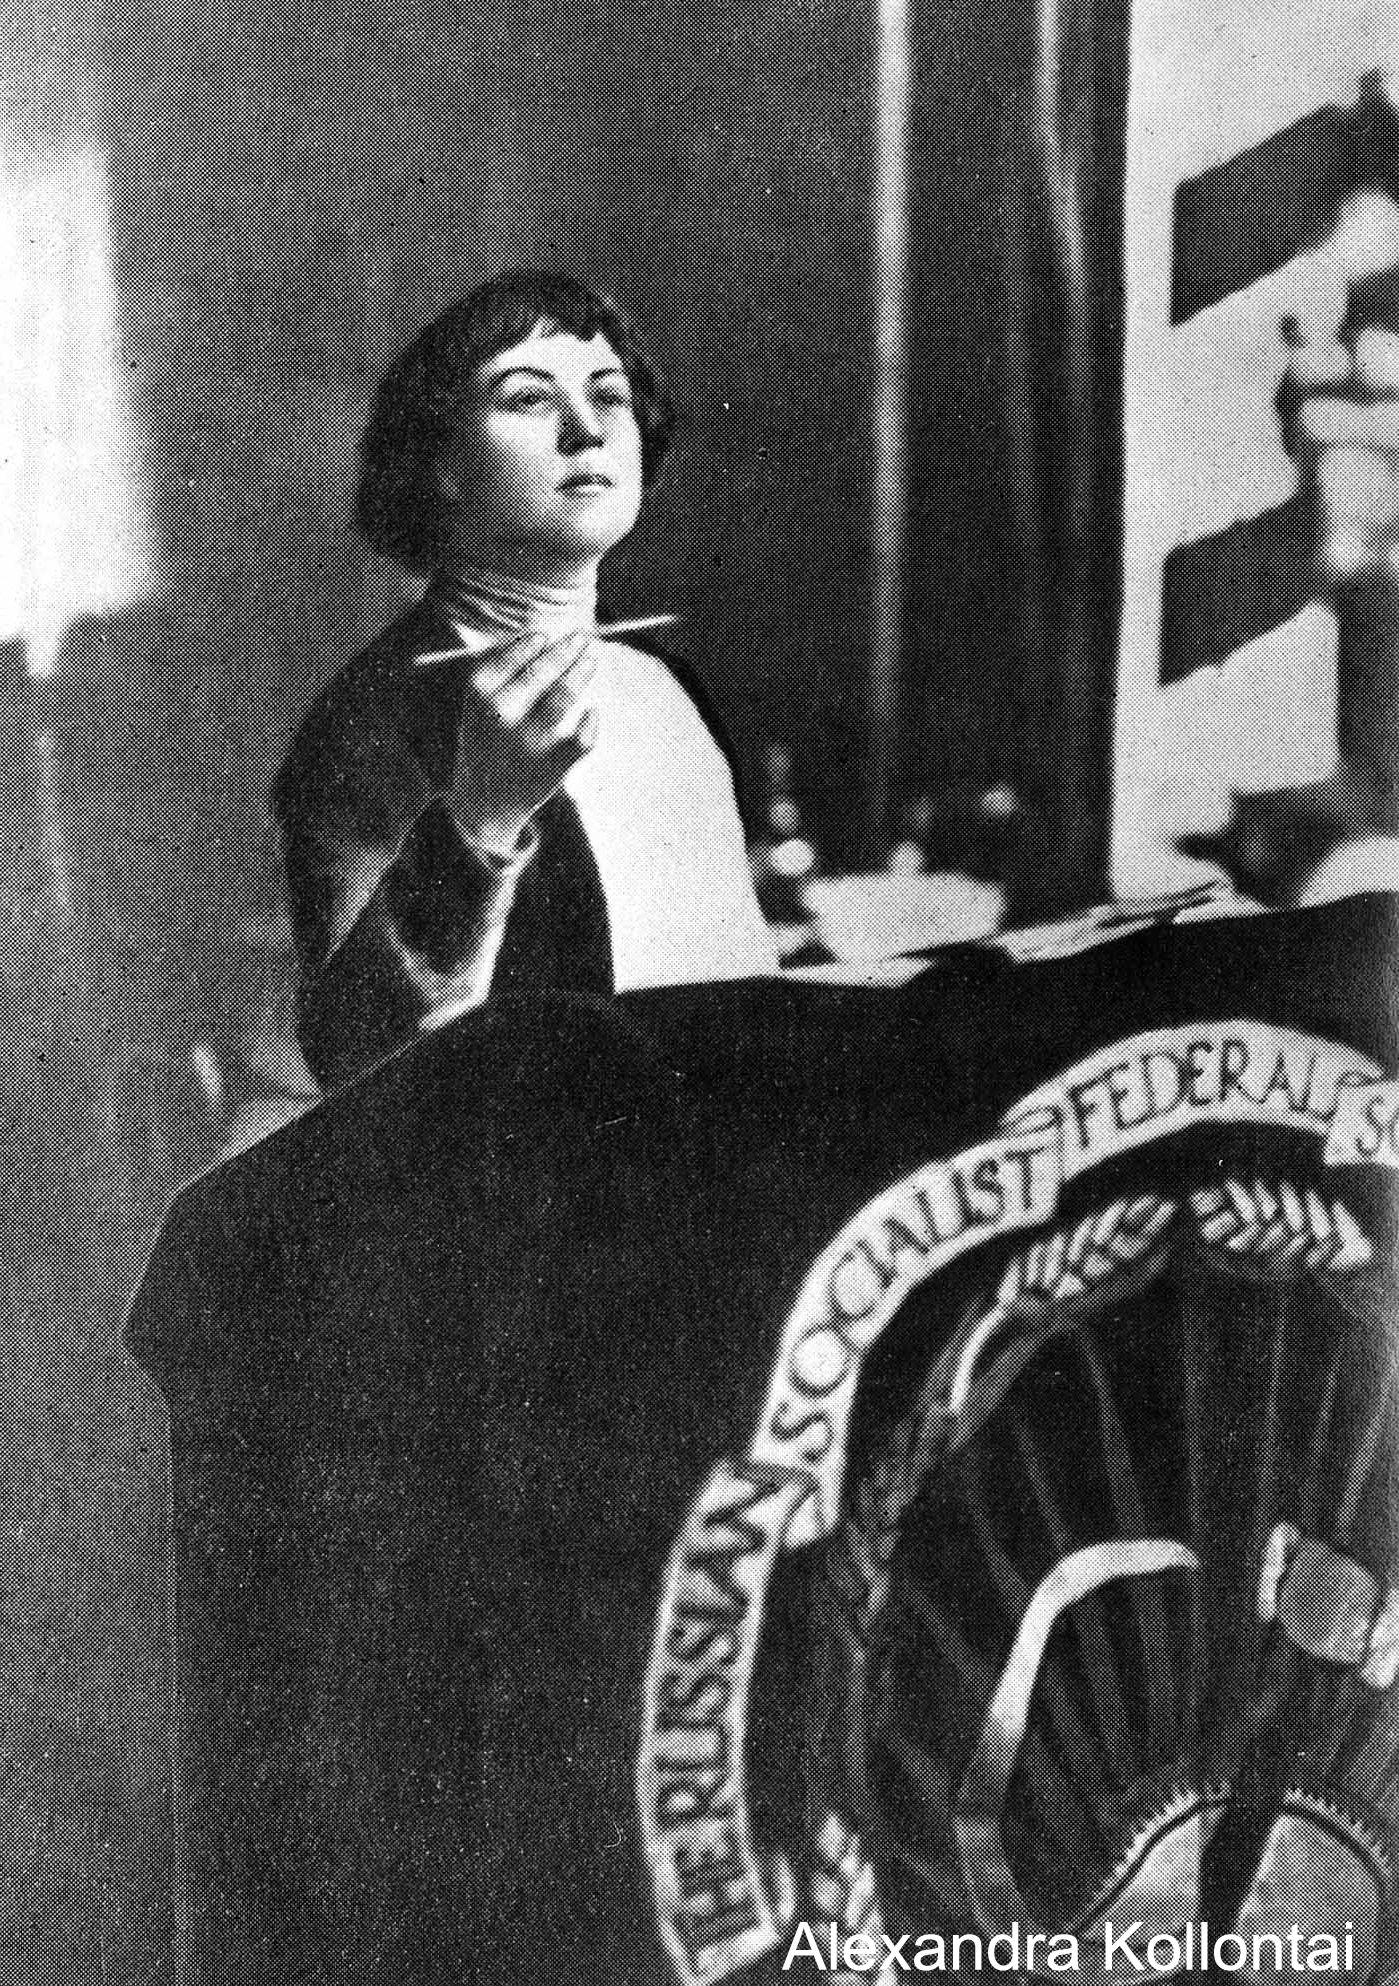 Alexandra Kollontai Russia 1872 1952 Bolshevik Feminist And